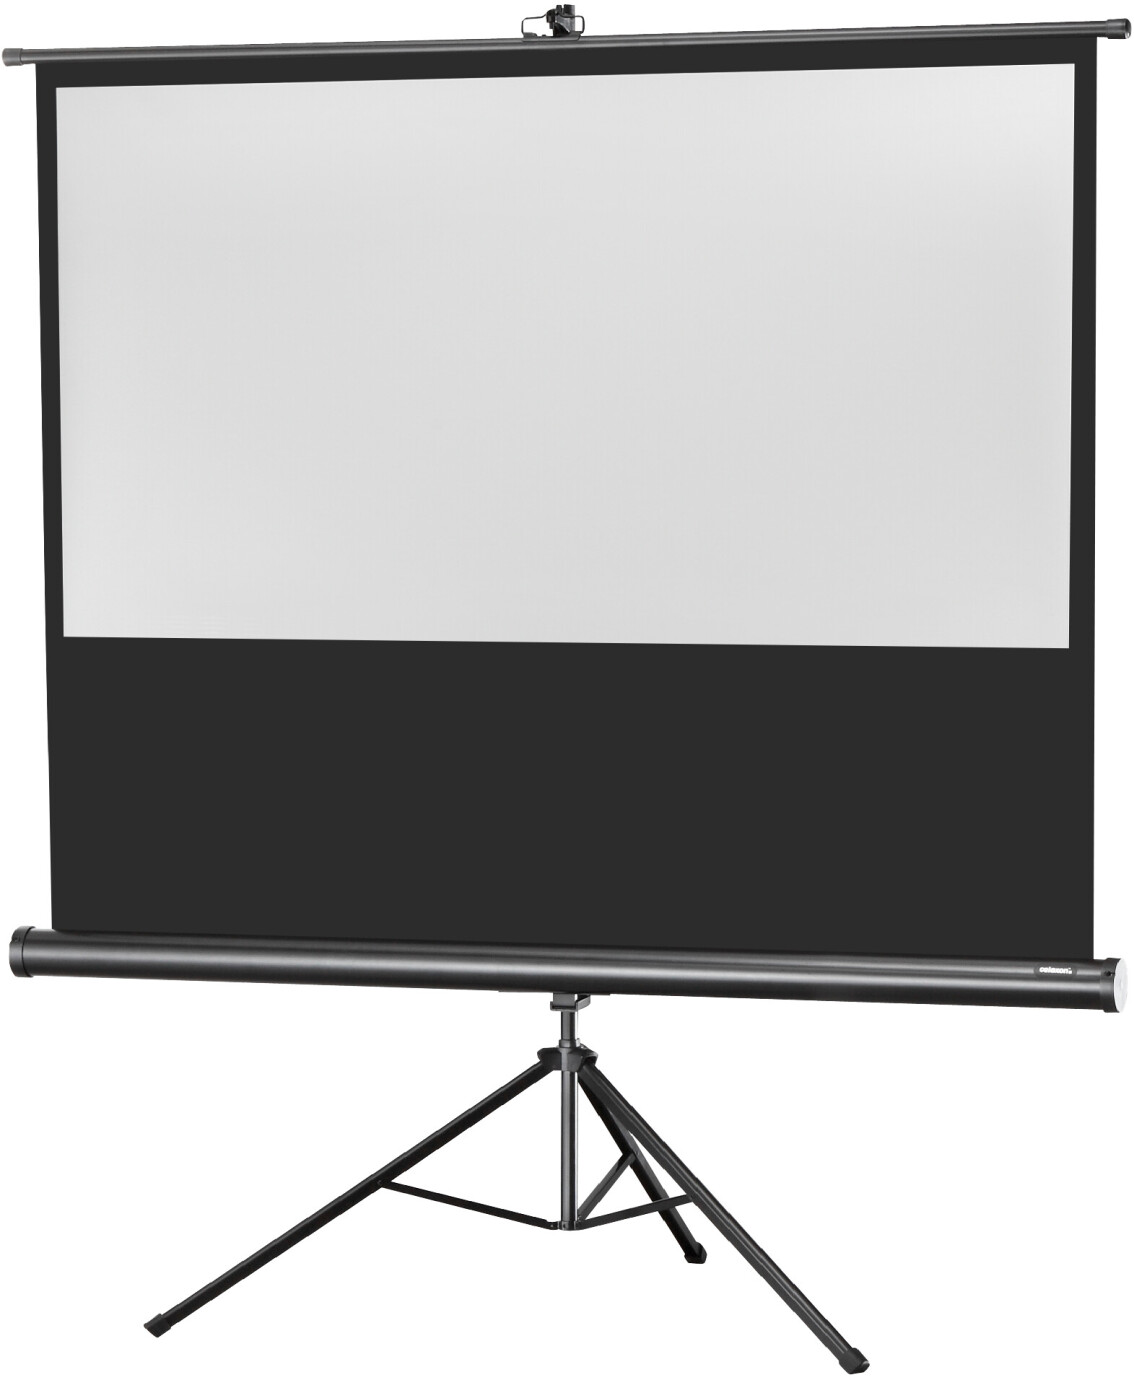 celexon Stativleinwand Economy 244 x 138 cm